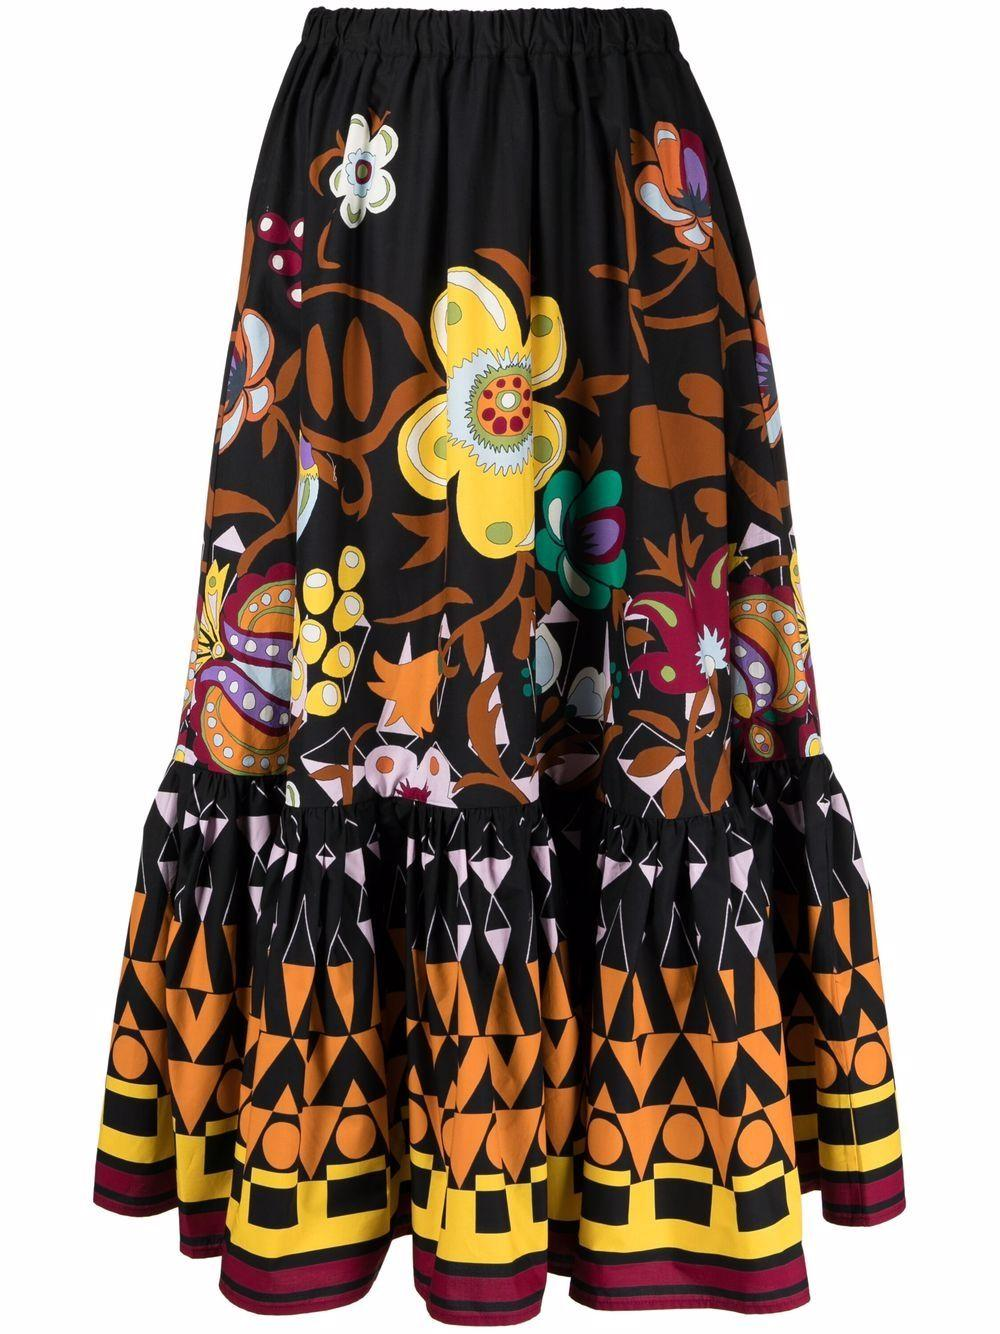 Sunset Maxi Skirt